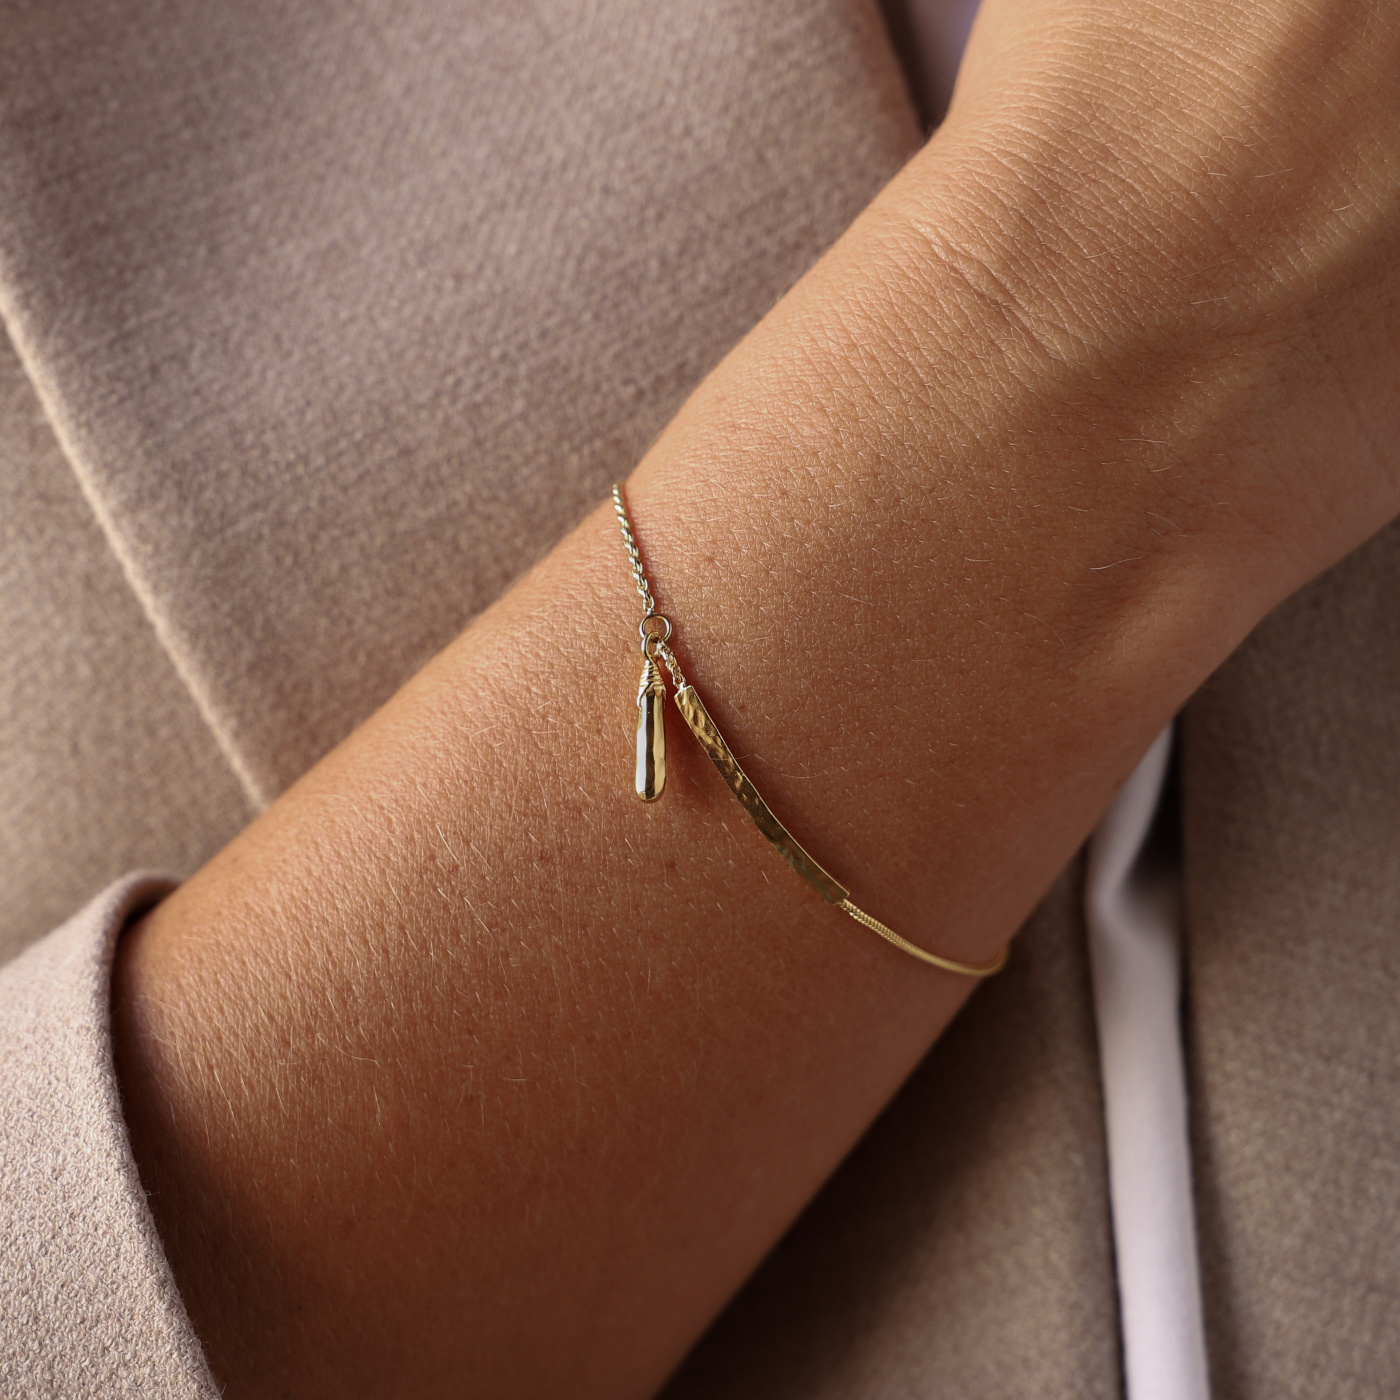 Violet Hamden Sisterhood Phoebe bracciale color oro in argento sterling 925